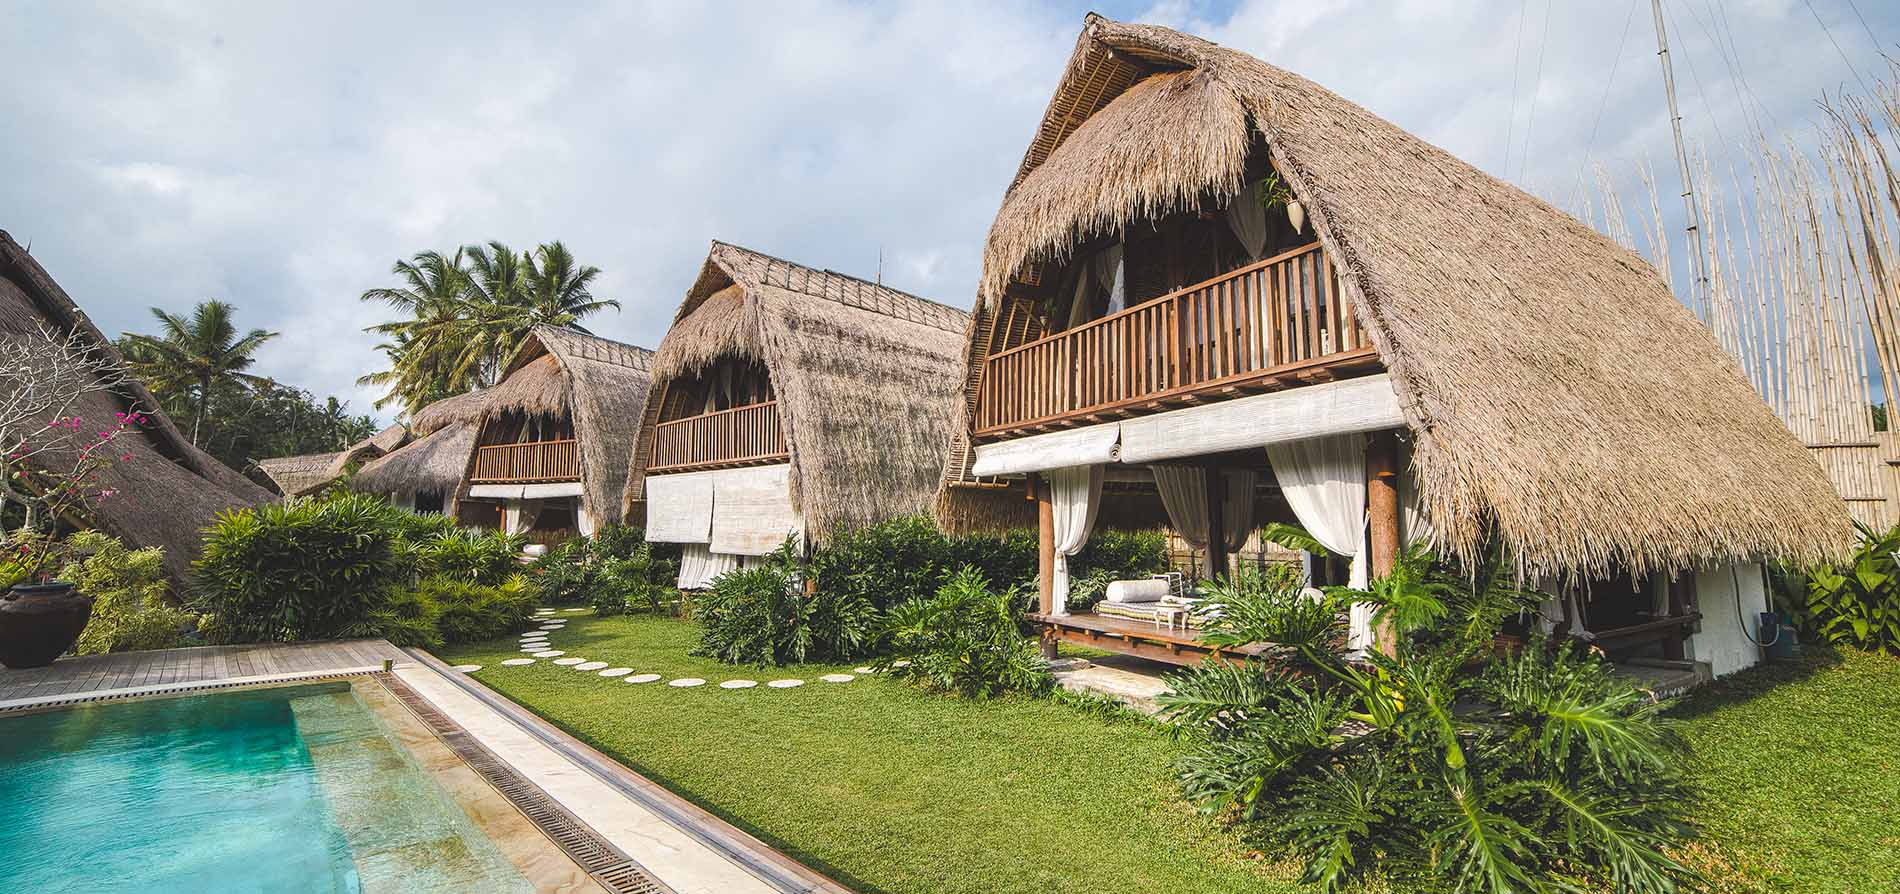 Luxury Resort In Bali The Best Boutique Hotel In Ubud Indonesia